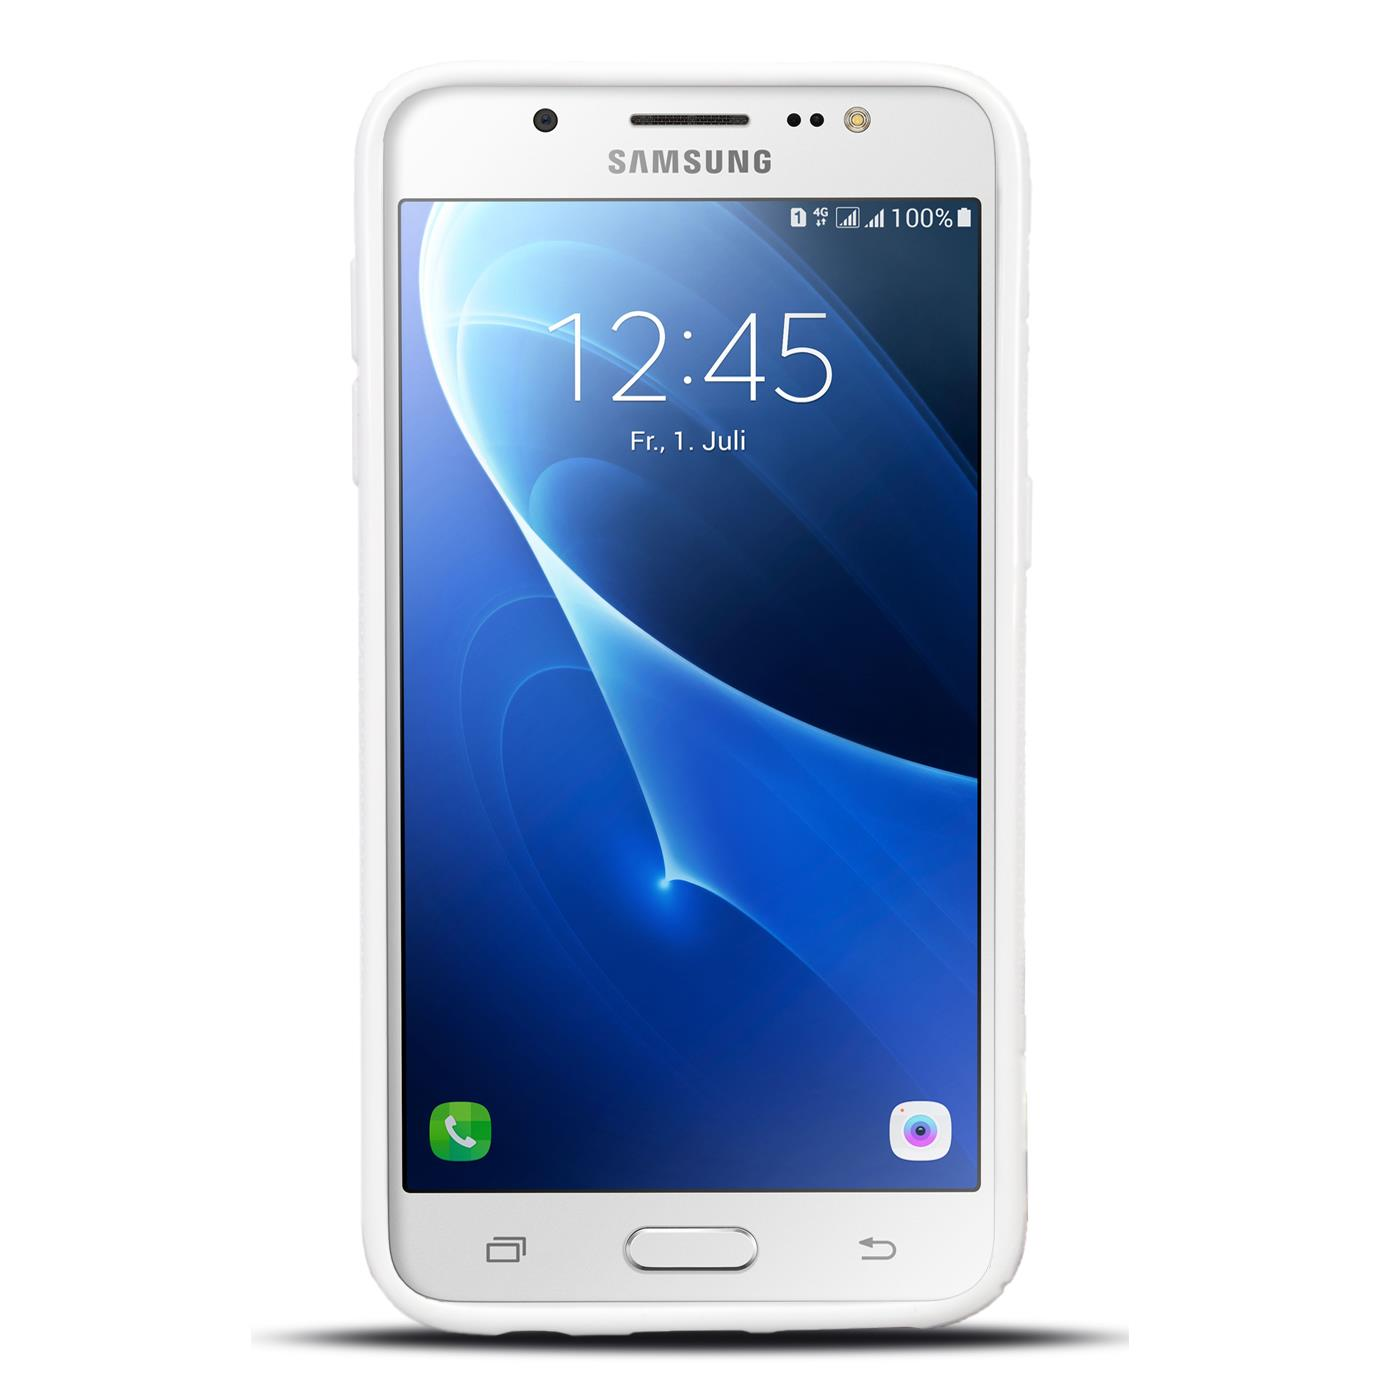 Samsung-Galaxy-j7-2016-Silikon-Gel-S-Line-Case-Cover-Duenn-Slim-Back-Bumper Indexbild 29